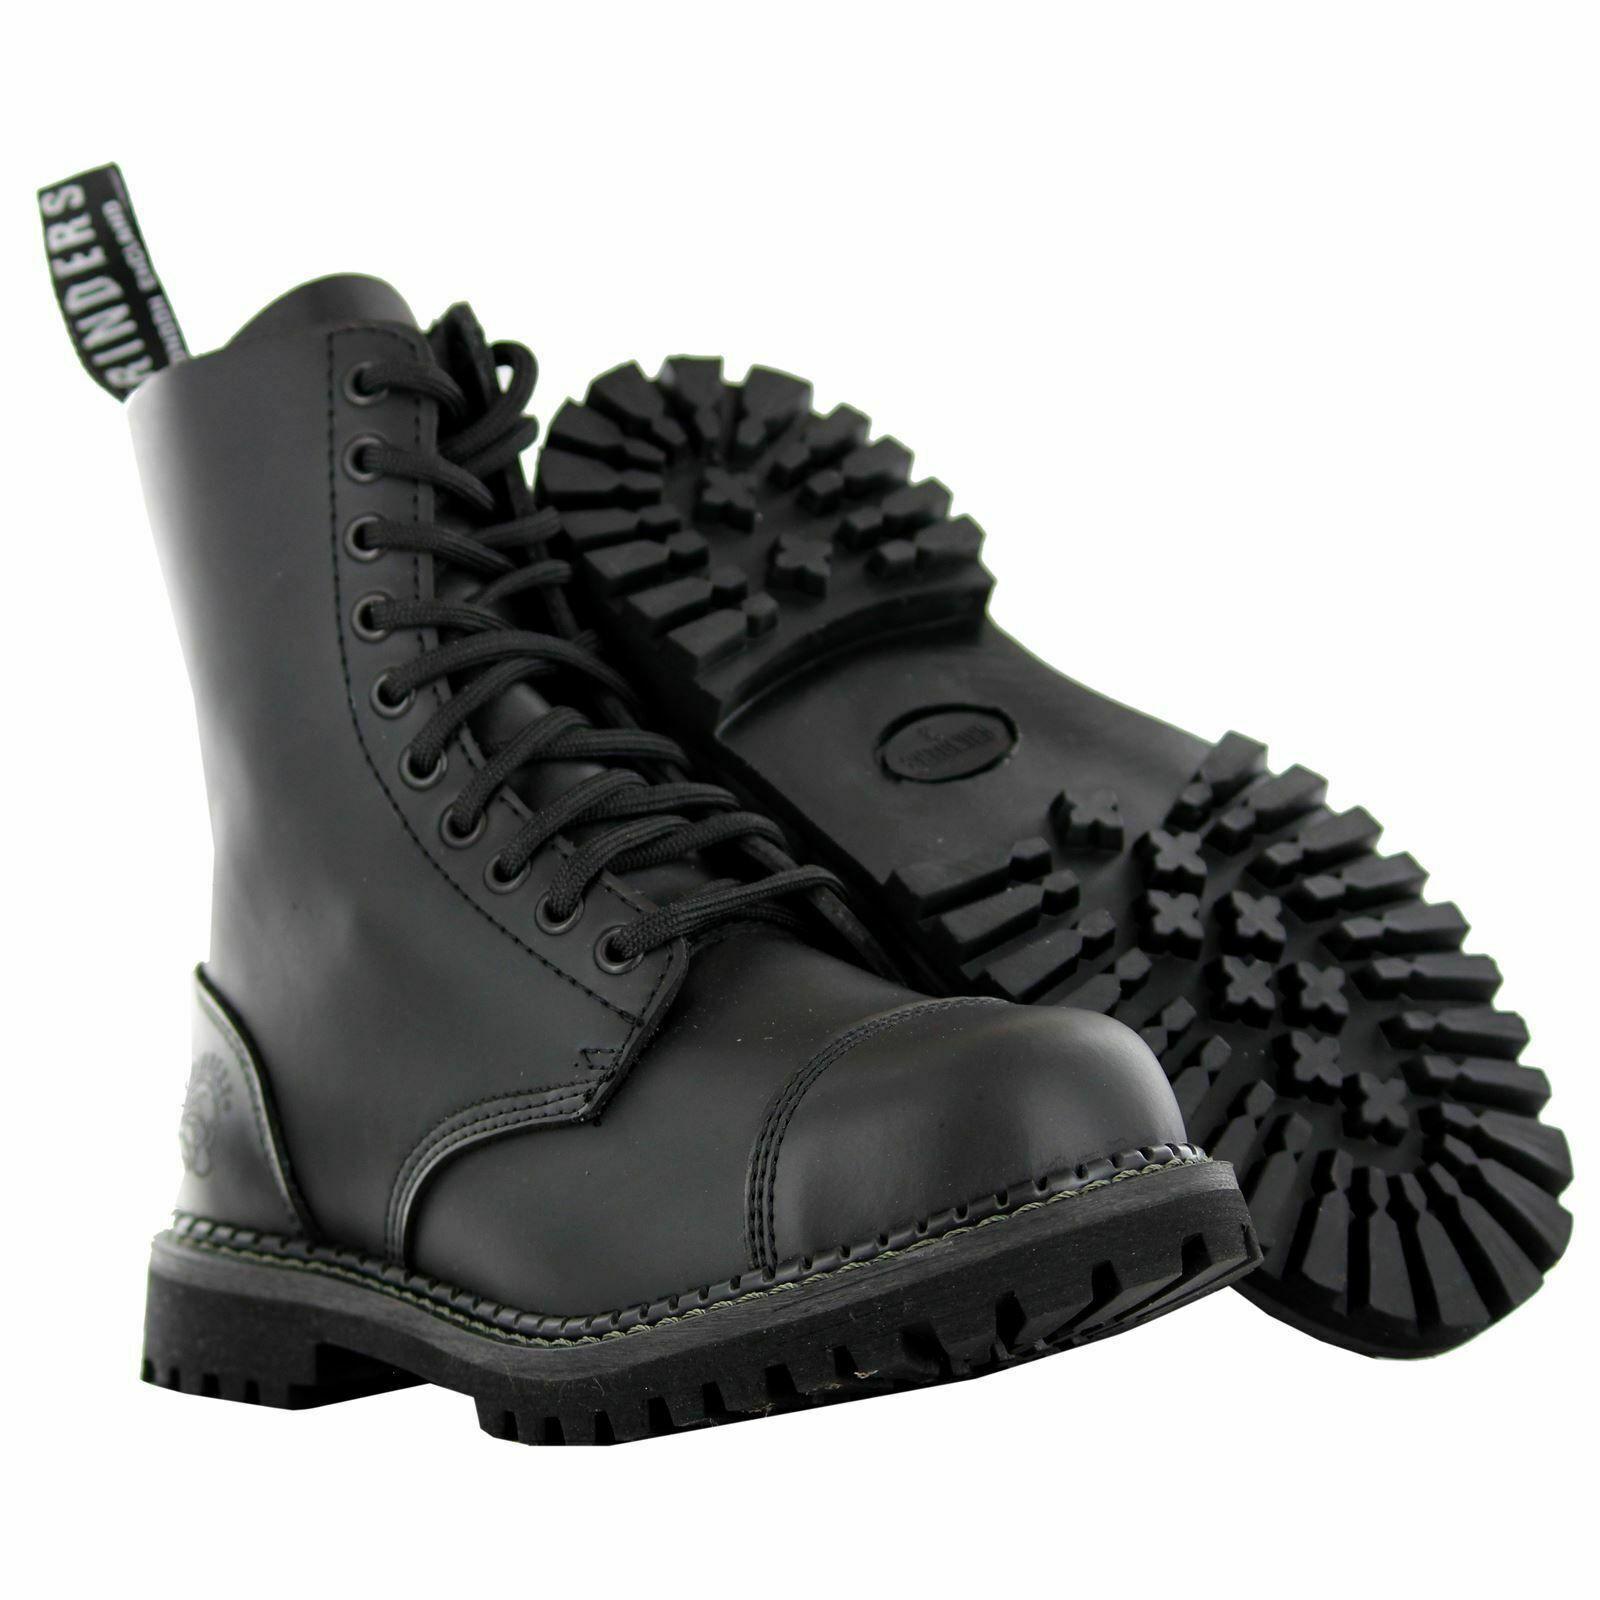 Grinders Stag CS DERBY Matt Finish Black Lace Up Leather Combat Uniform Boots